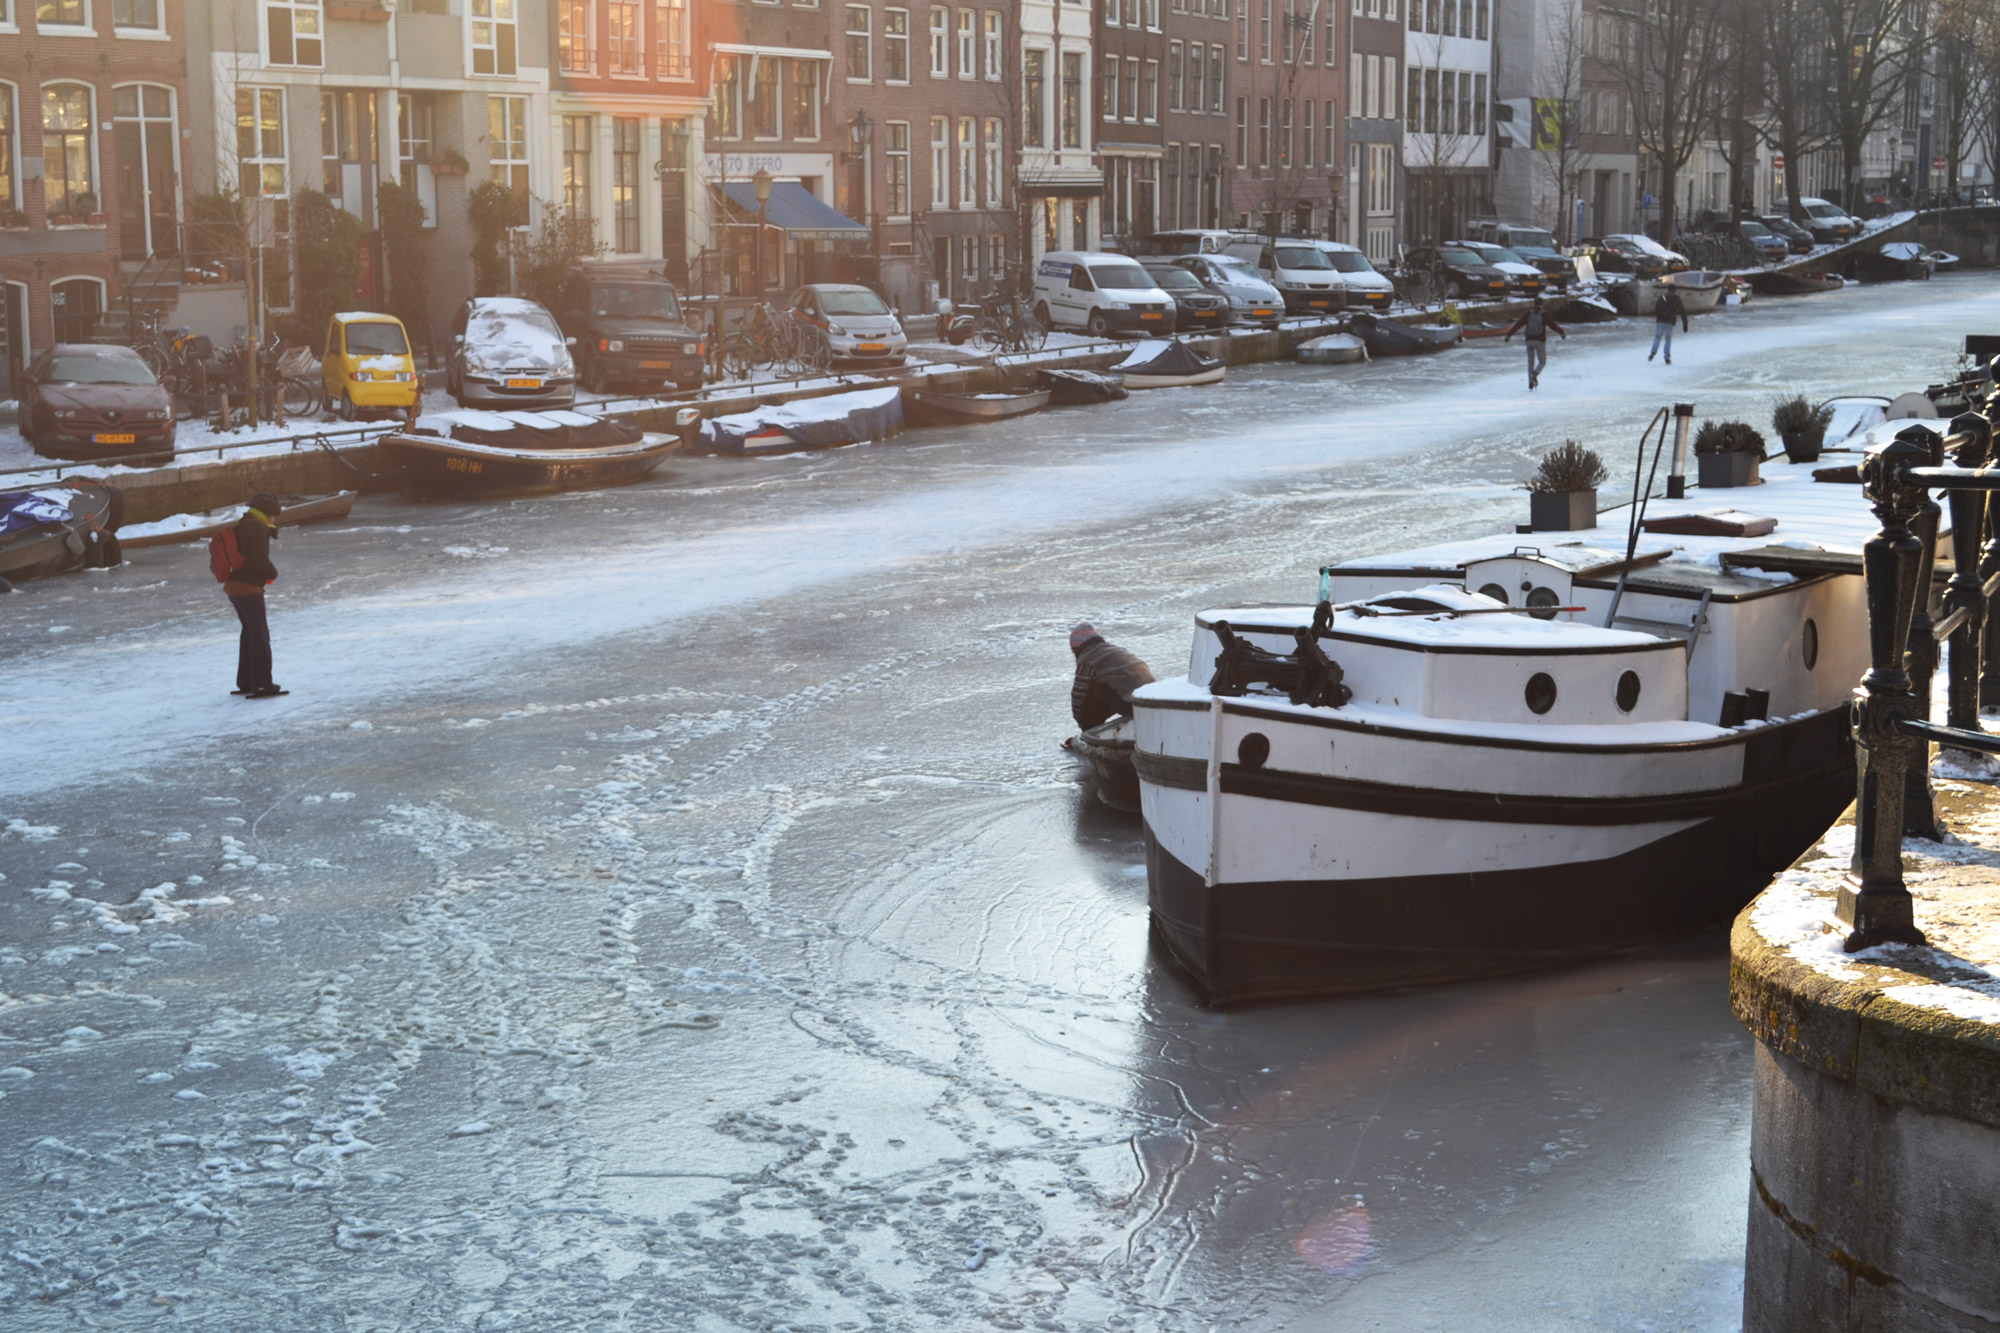 urbanbacklog-amsterdam-canal-houses-6.jpg